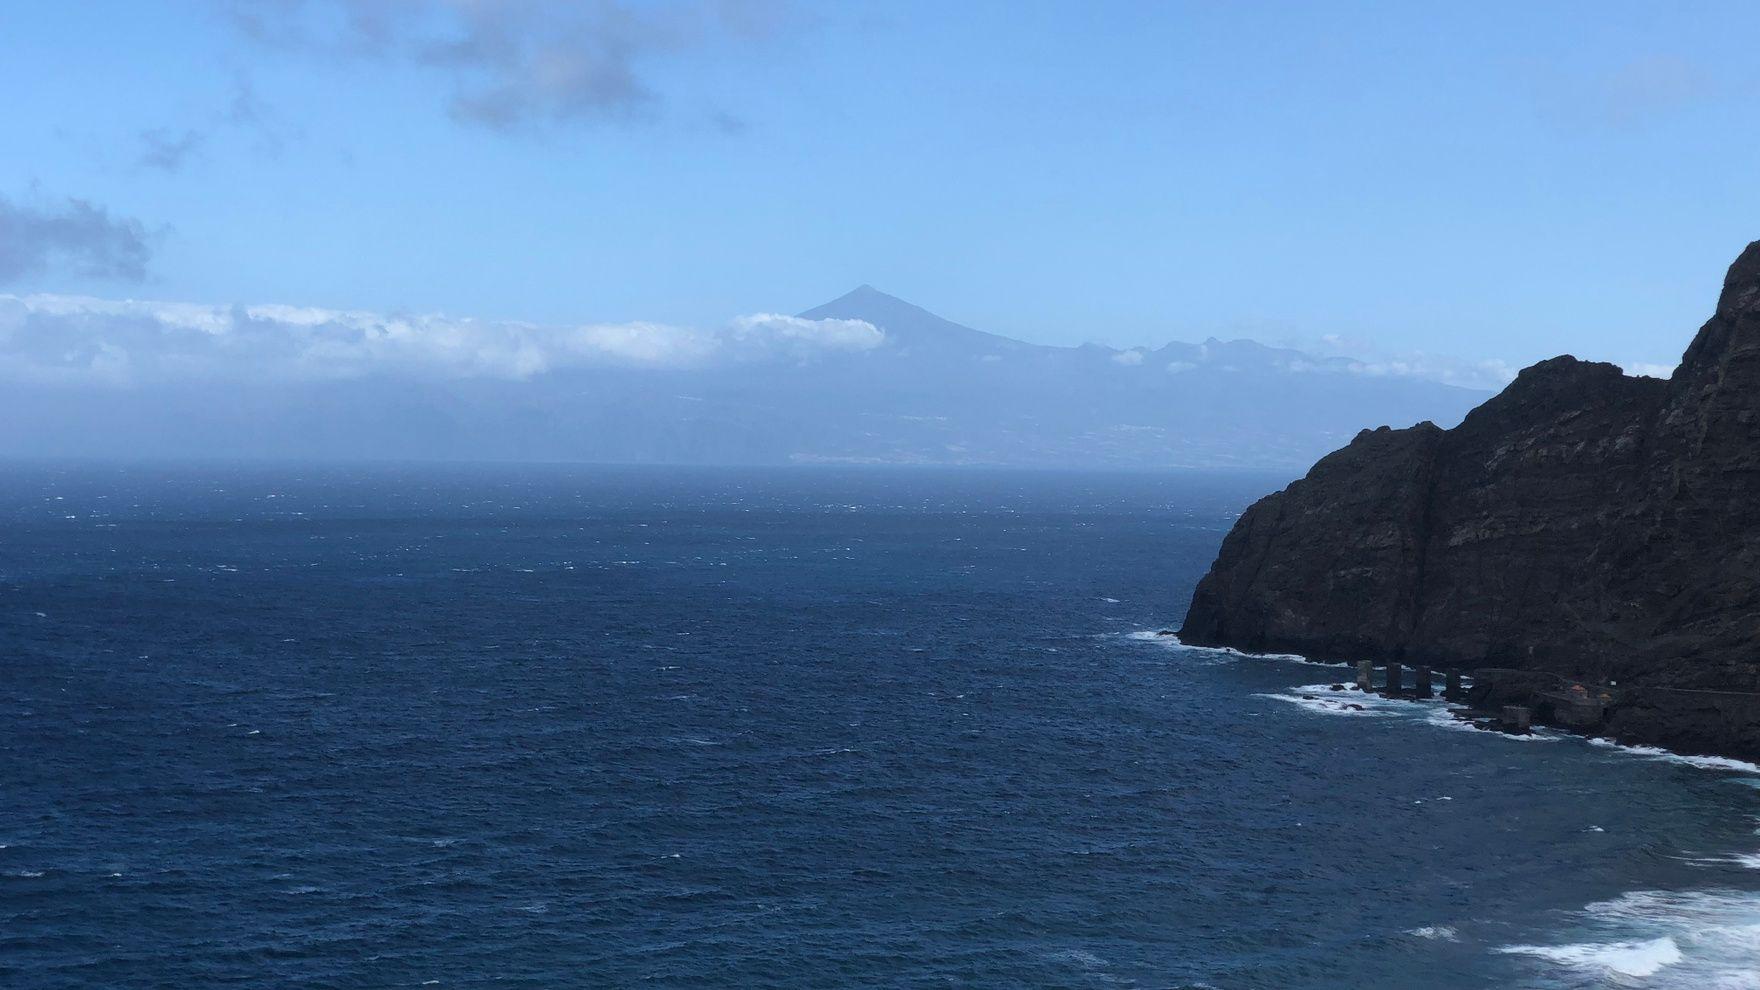 Canaries, 4islands in10days: Tenerife— LaGomera— LaPalma— Hierro.310nm